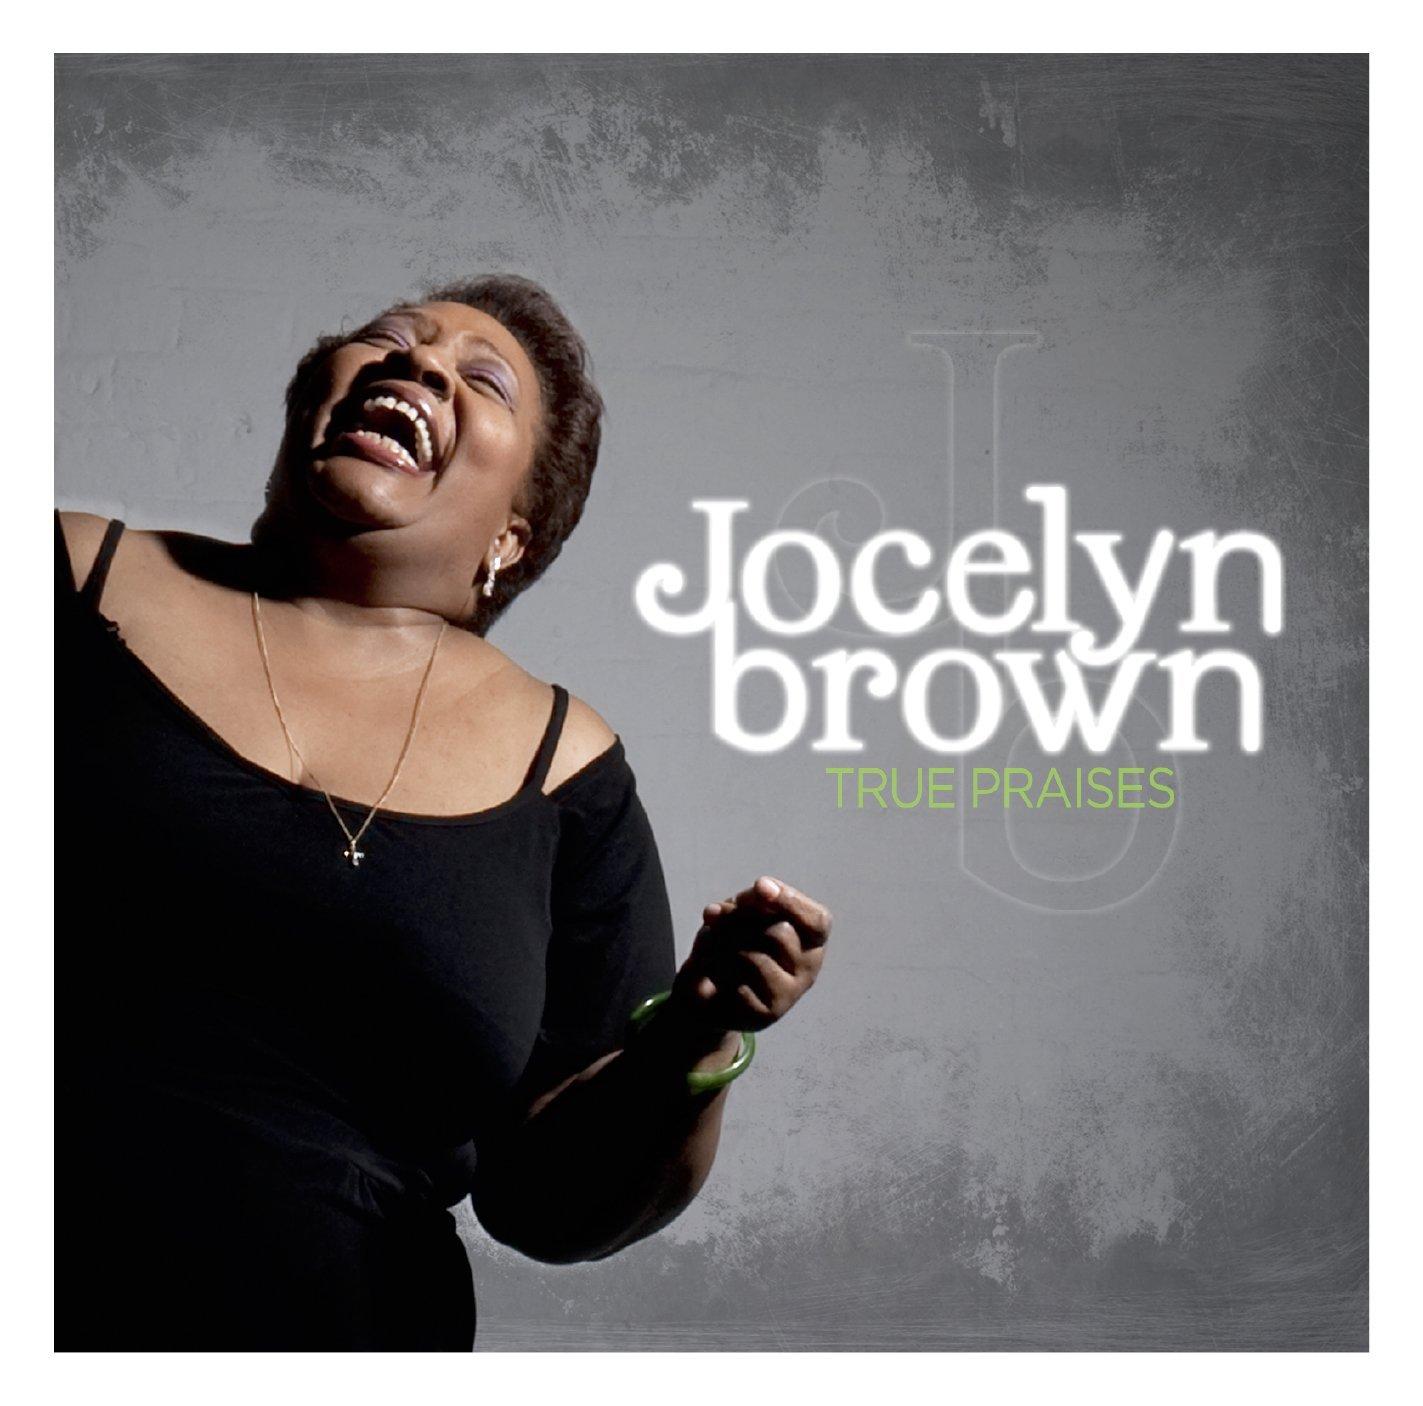 Jocelyn Brown - True Praises